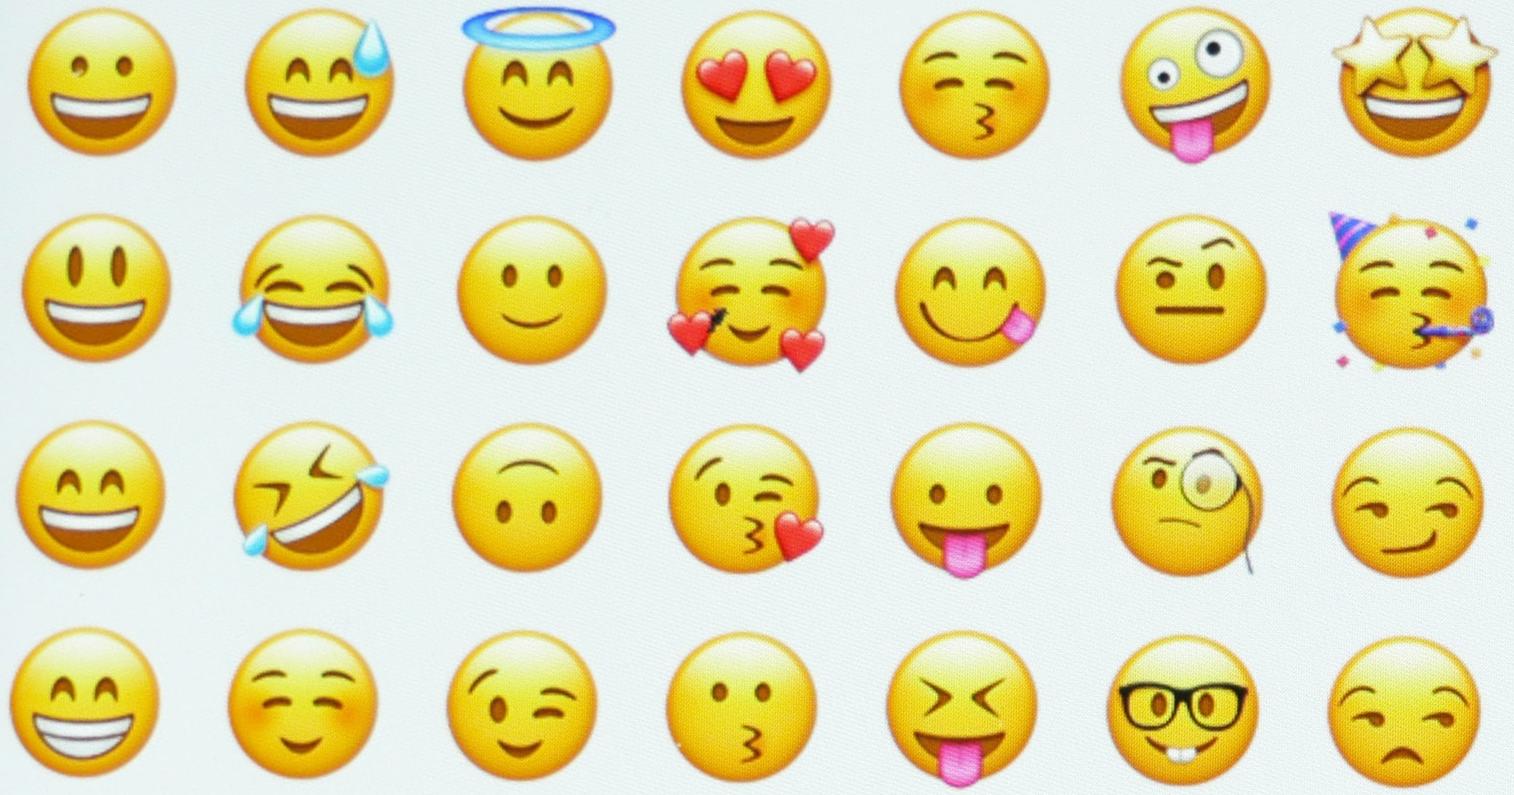 A collection of emojis - Photo by Denis Cherkashin on Unsplash